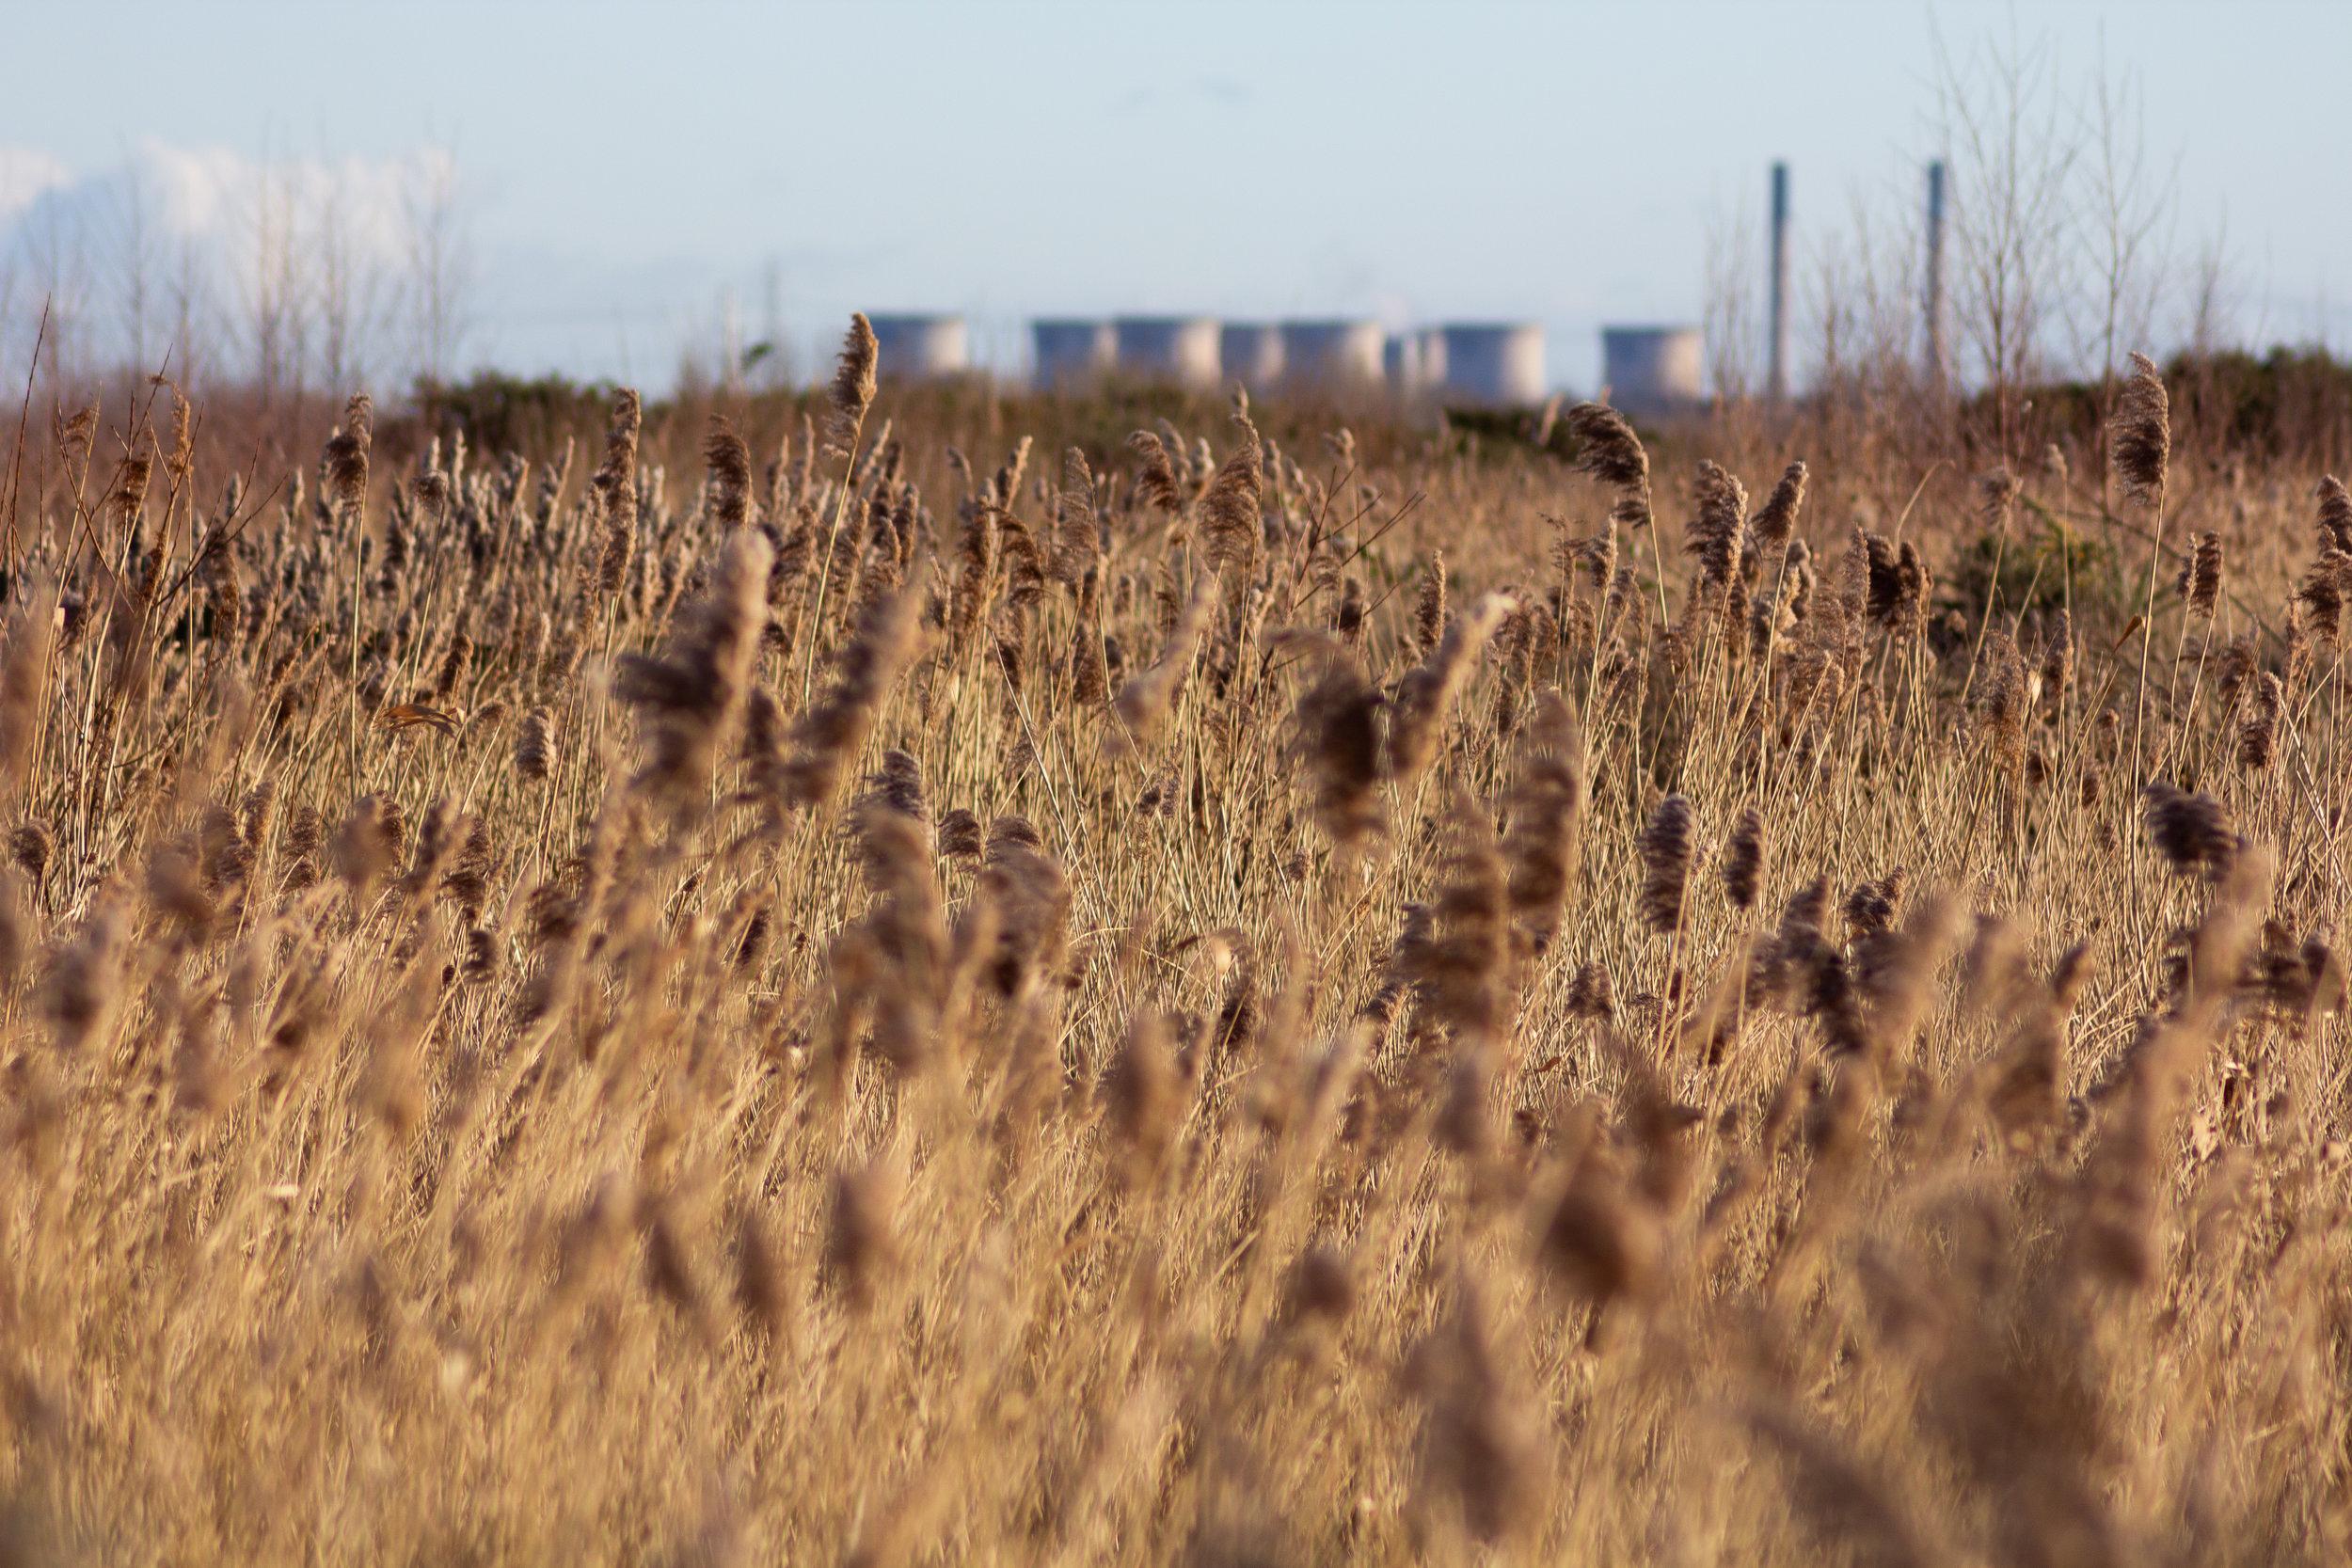 Ferrybridge Power Station through Reeds